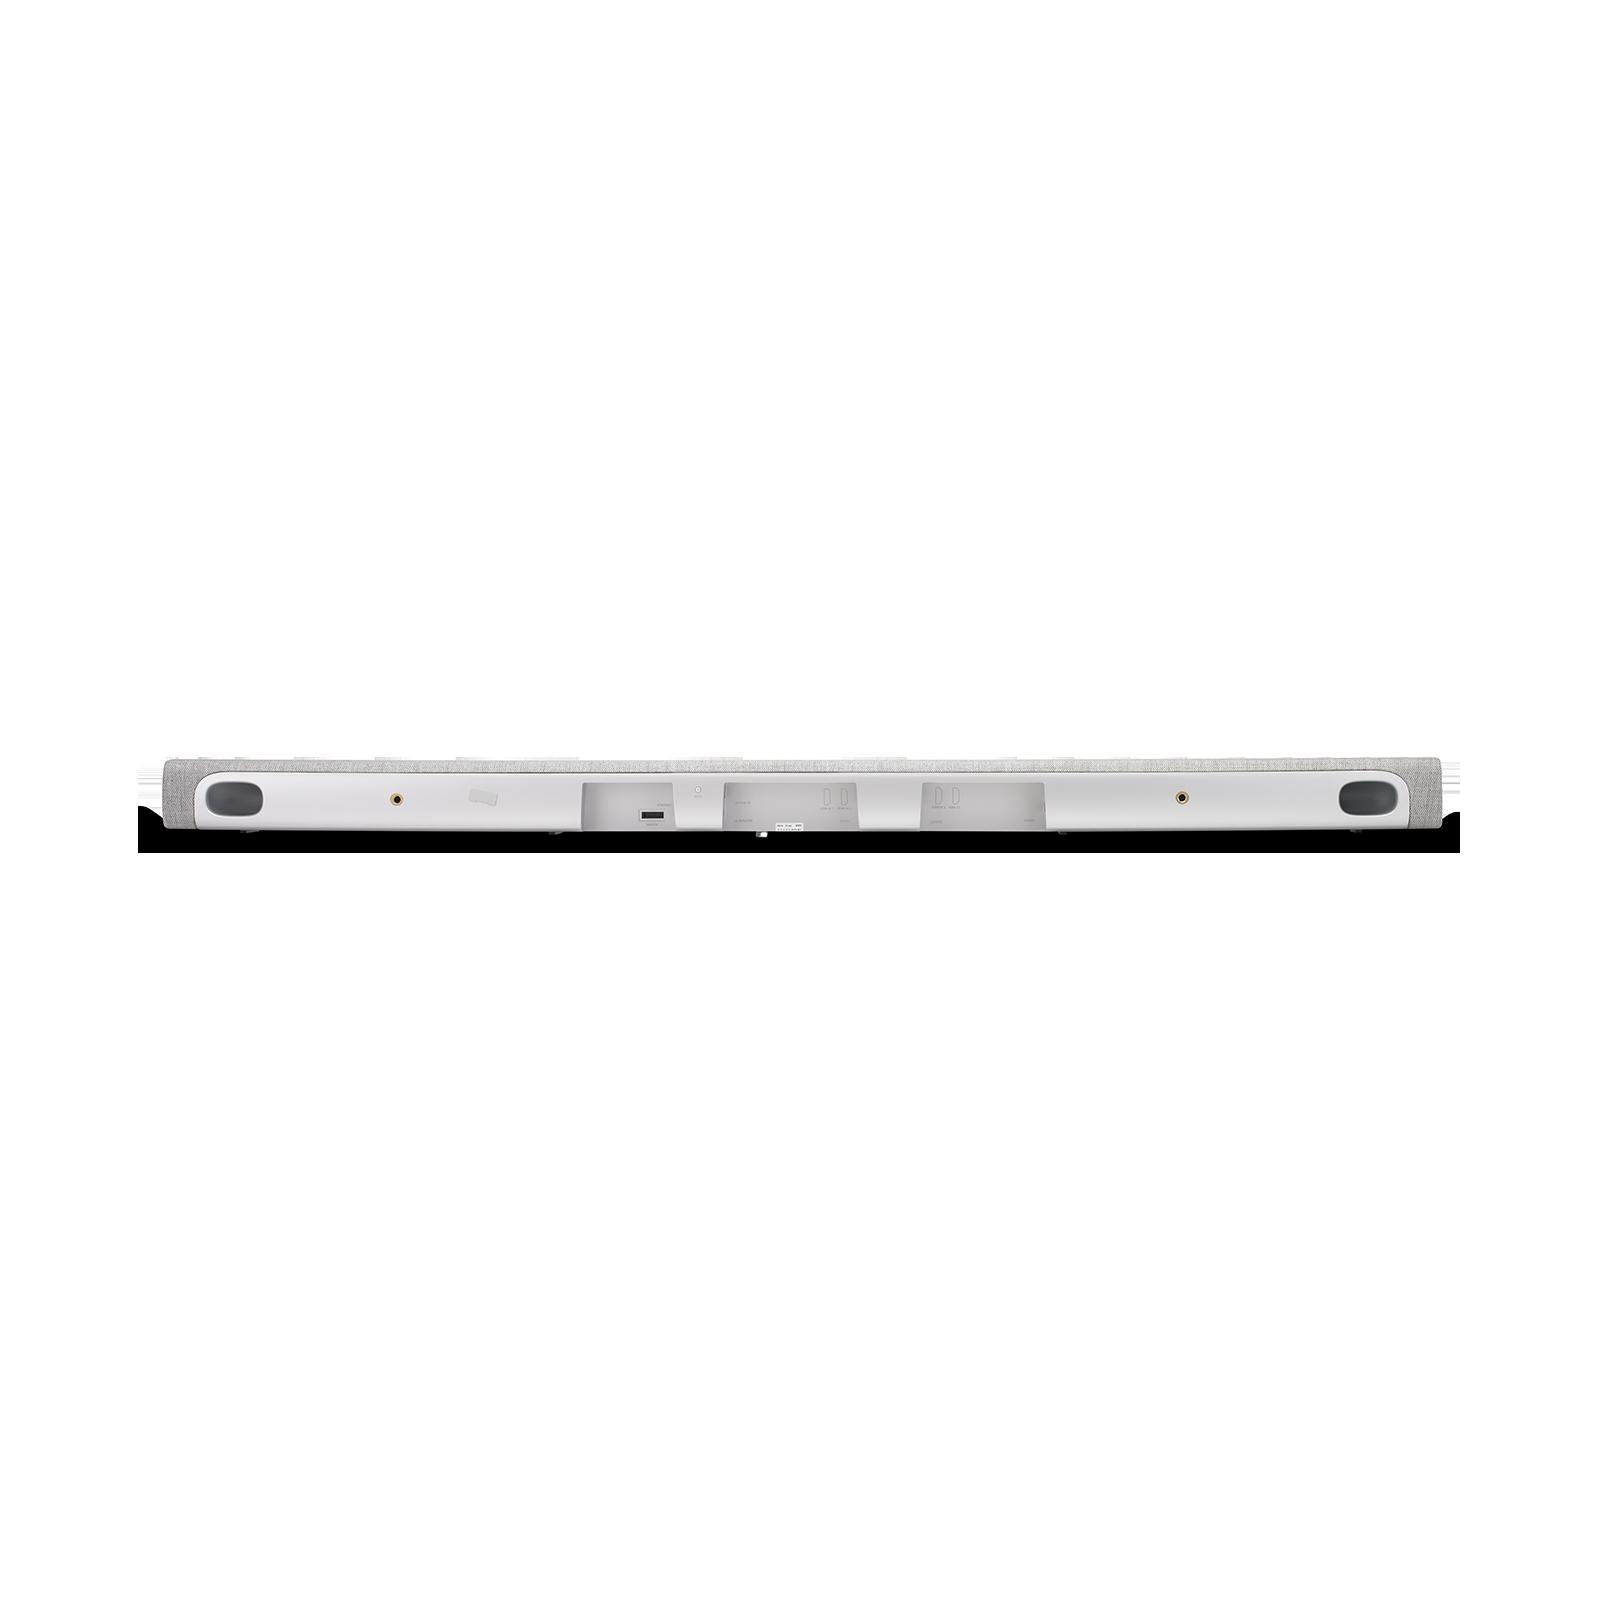 Harman Kardon Citation Bar - Grey - The smartest soundbar for movies and music - Back